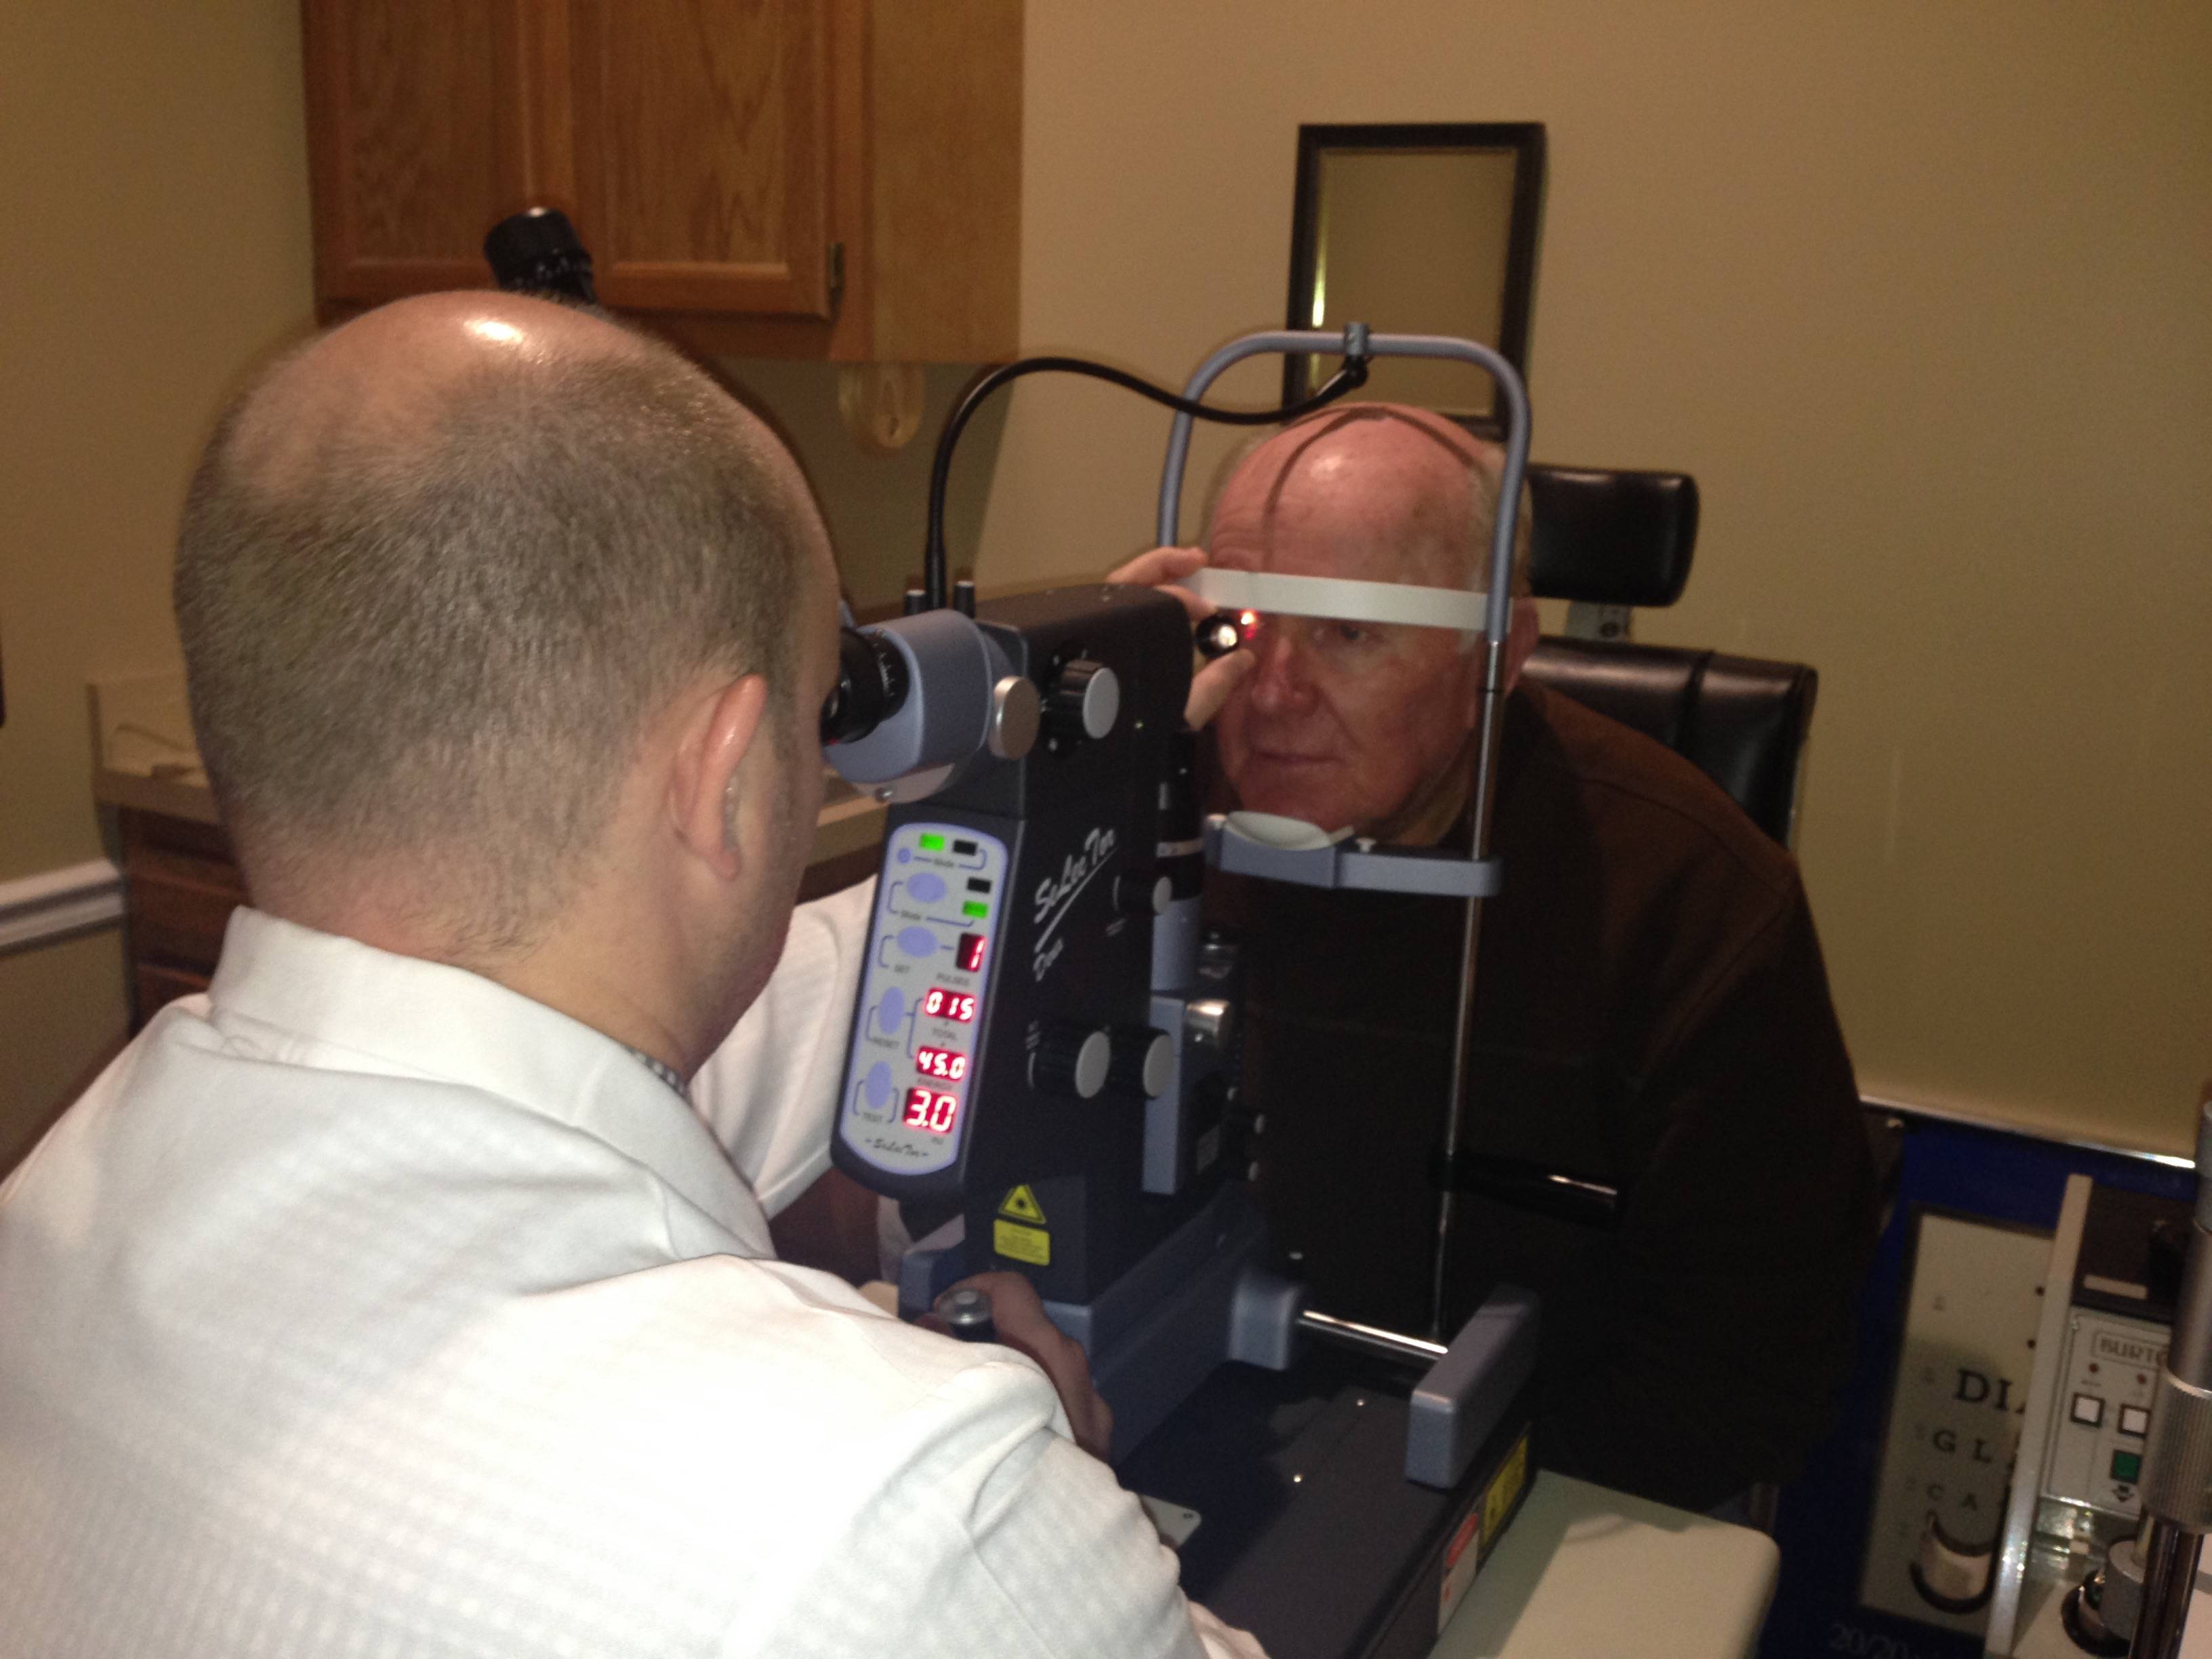 Dr. Burchett & YAG Laser Therapy Equipment